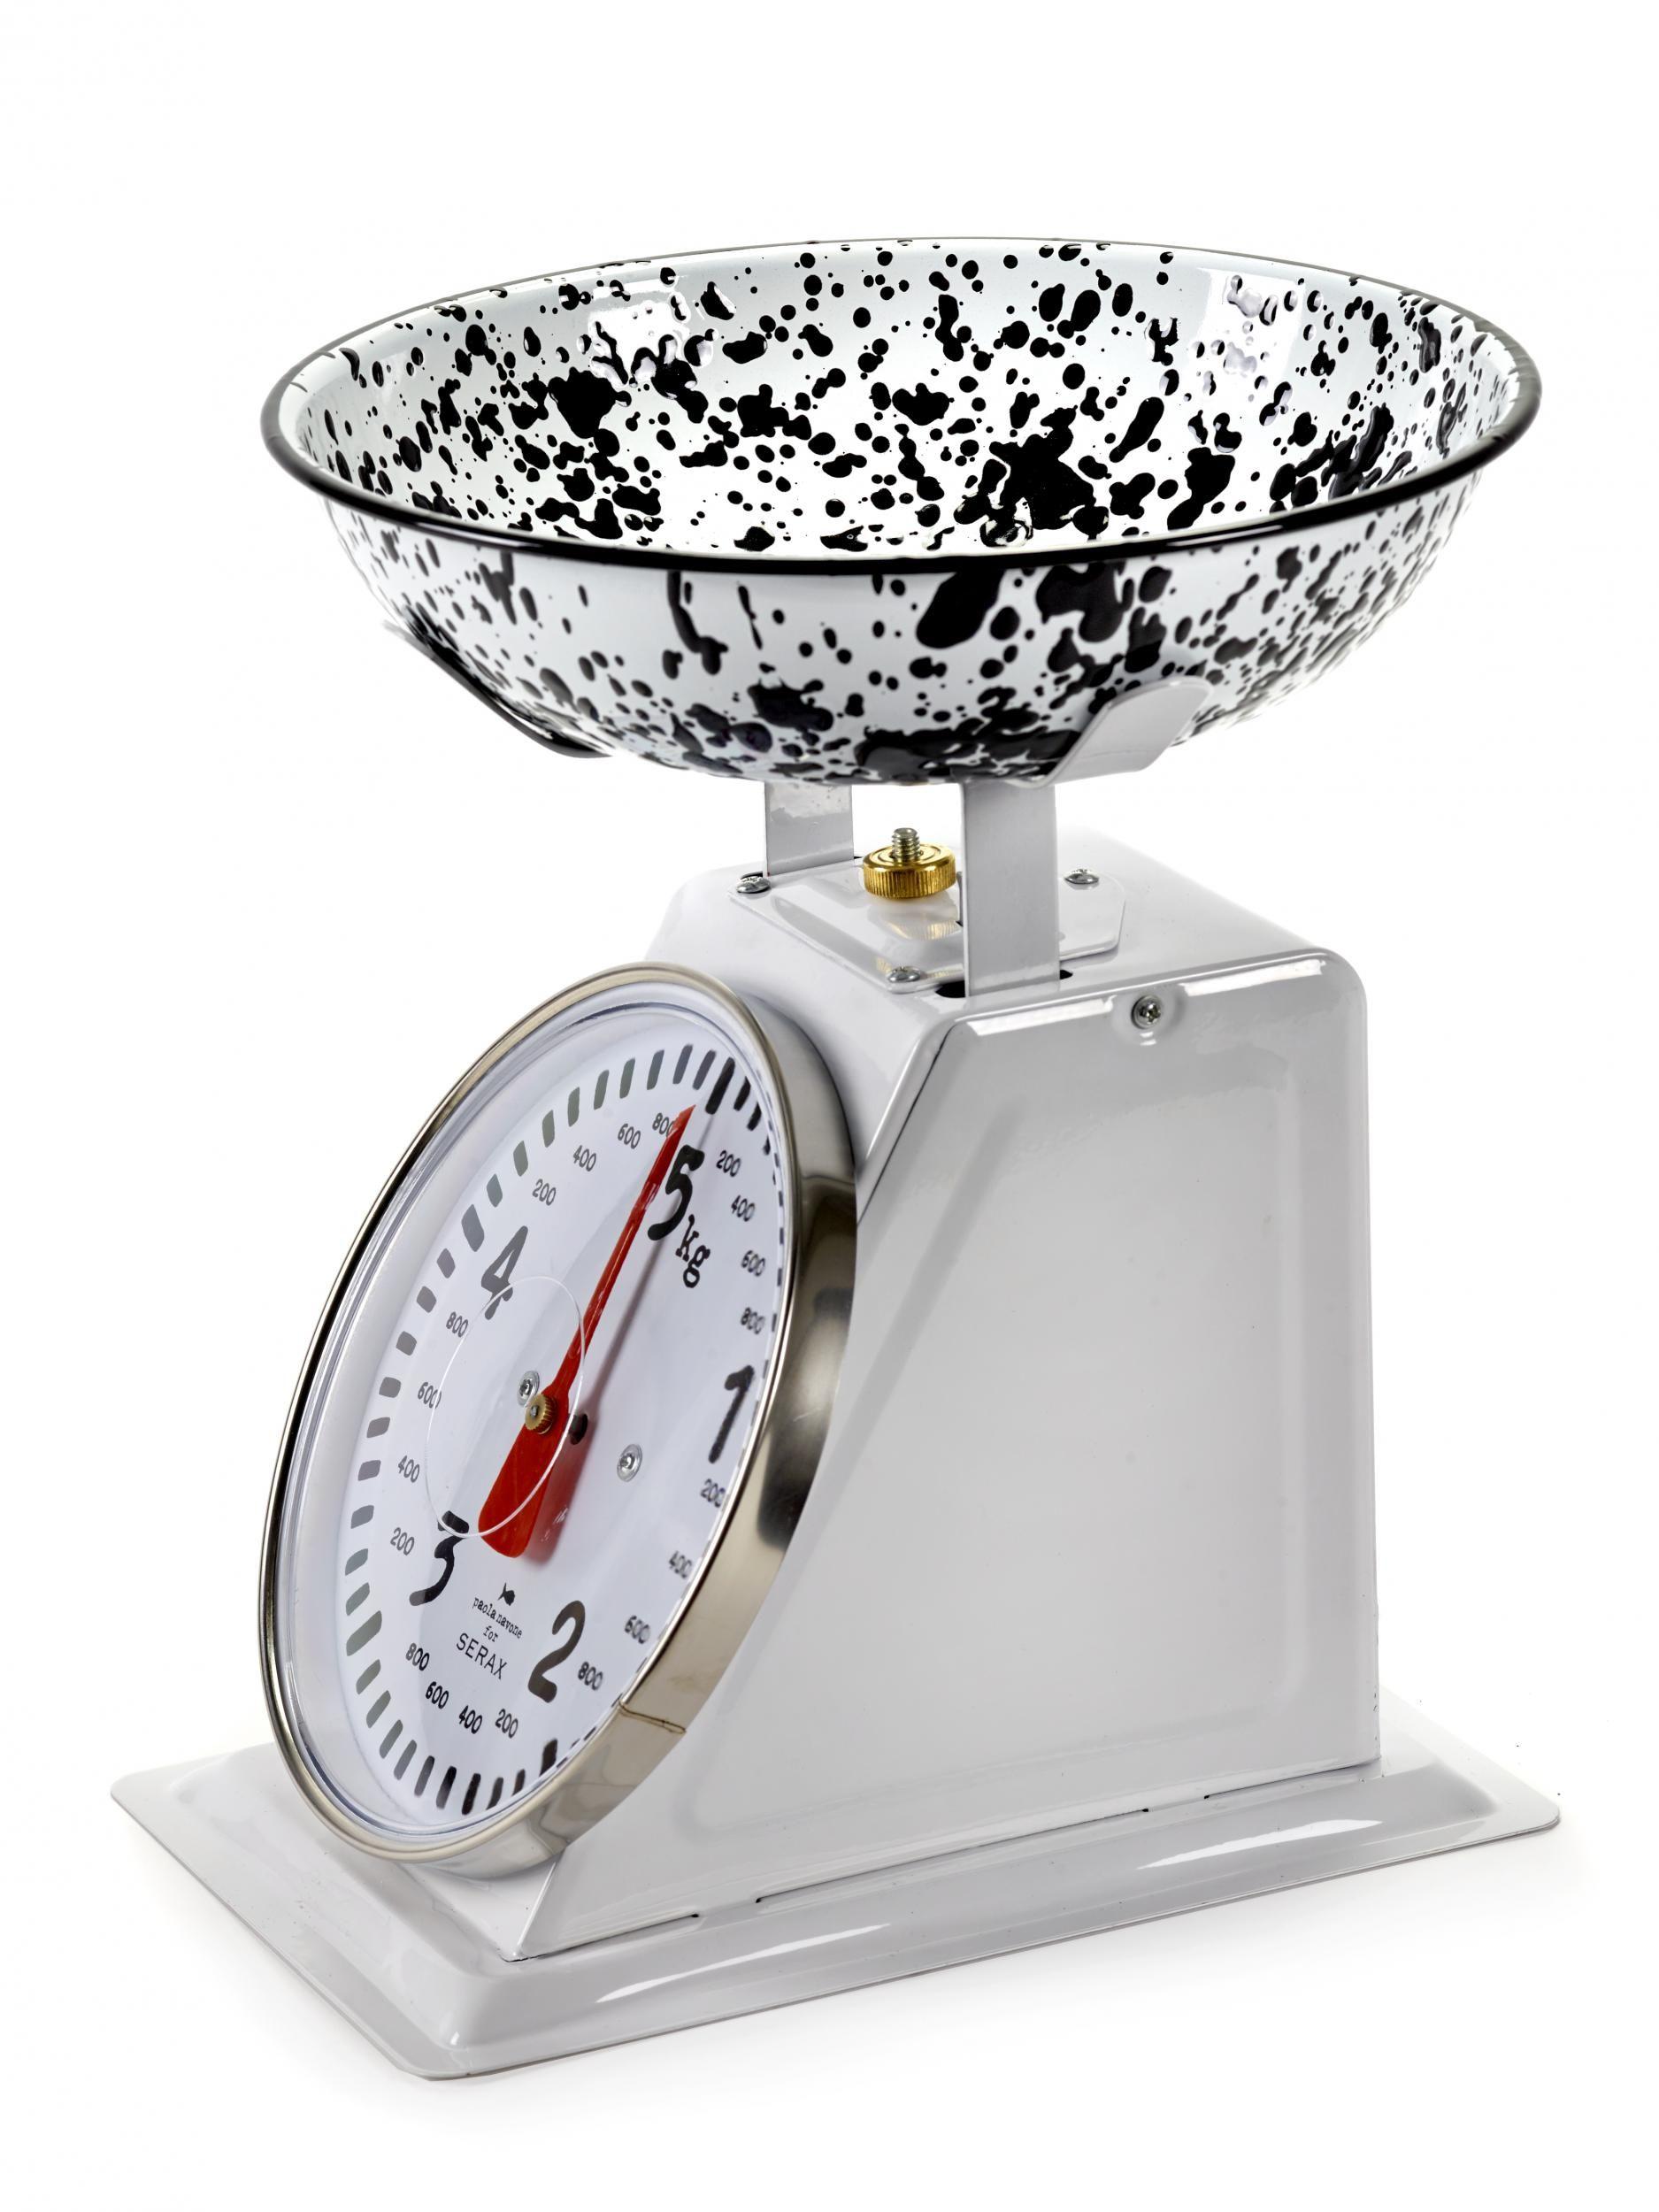 Pasta Pasta Mechanical kitchen scales - / 5 Kg Black & white by Serax